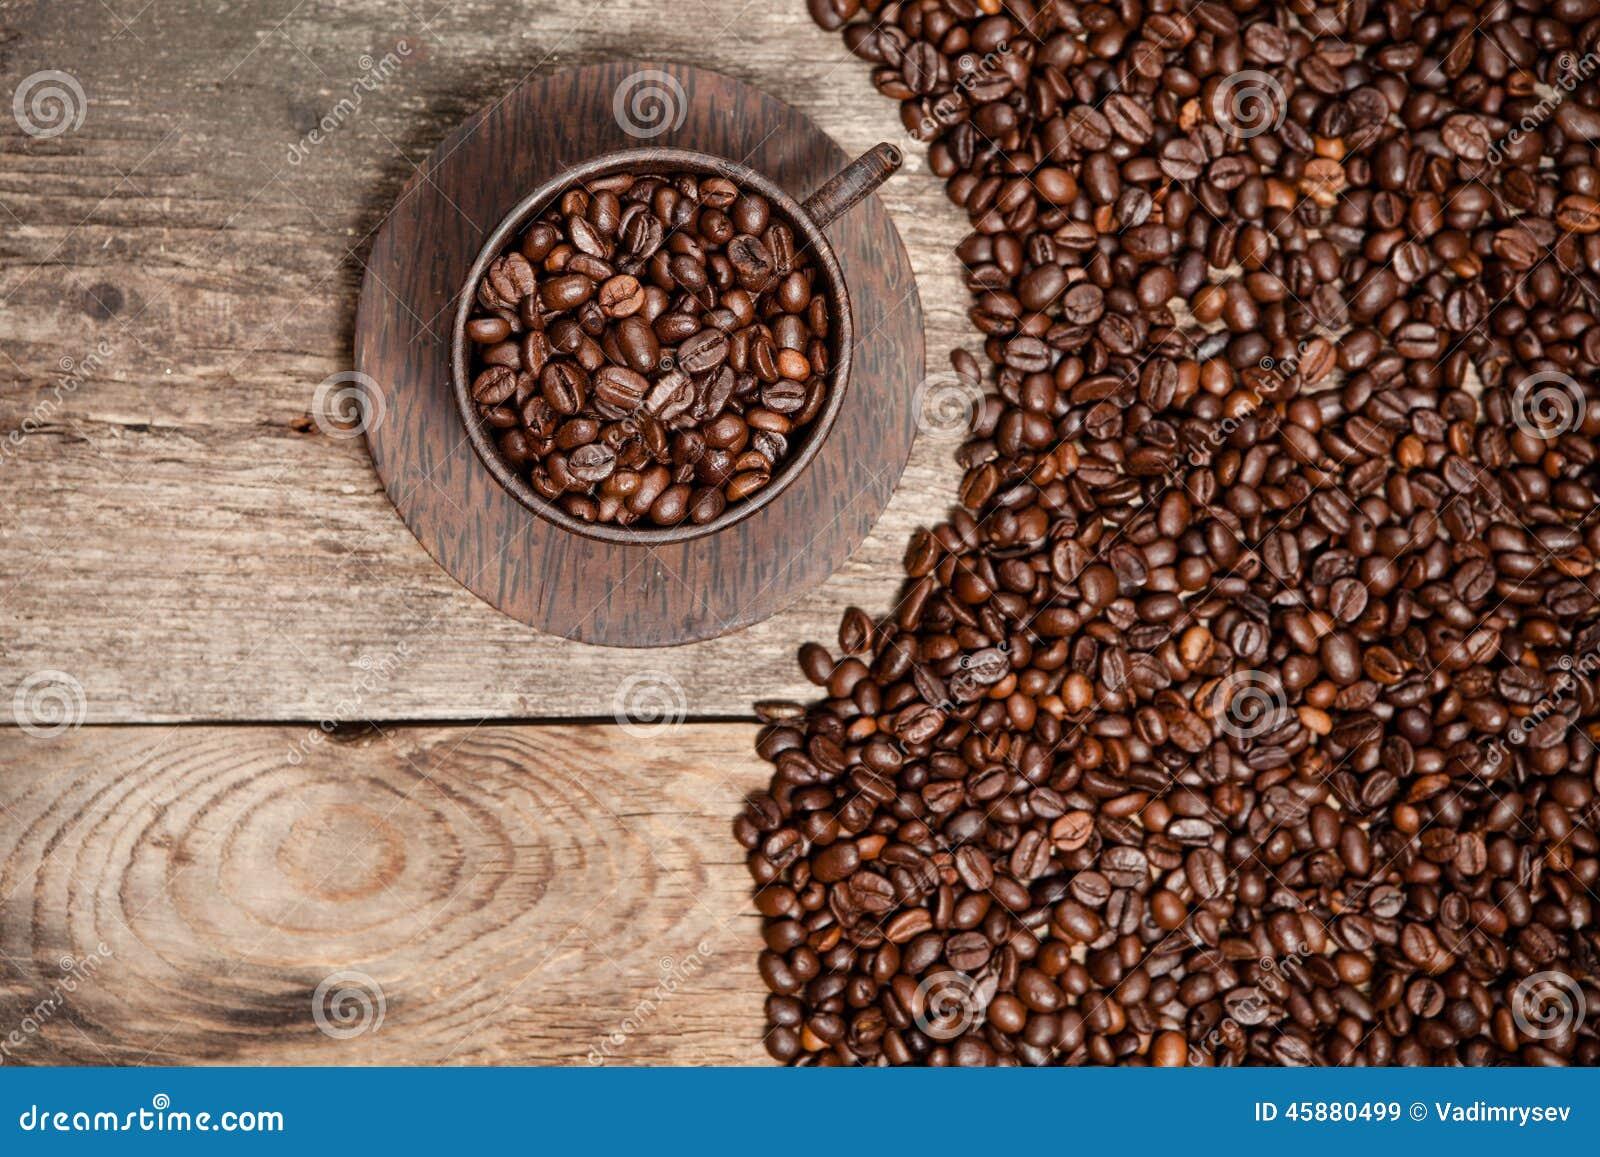 Astounding Coffee Cup With Coffee Beans On Wooden Table Stock Image Inzonedesignstudio Interior Chair Design Inzonedesignstudiocom